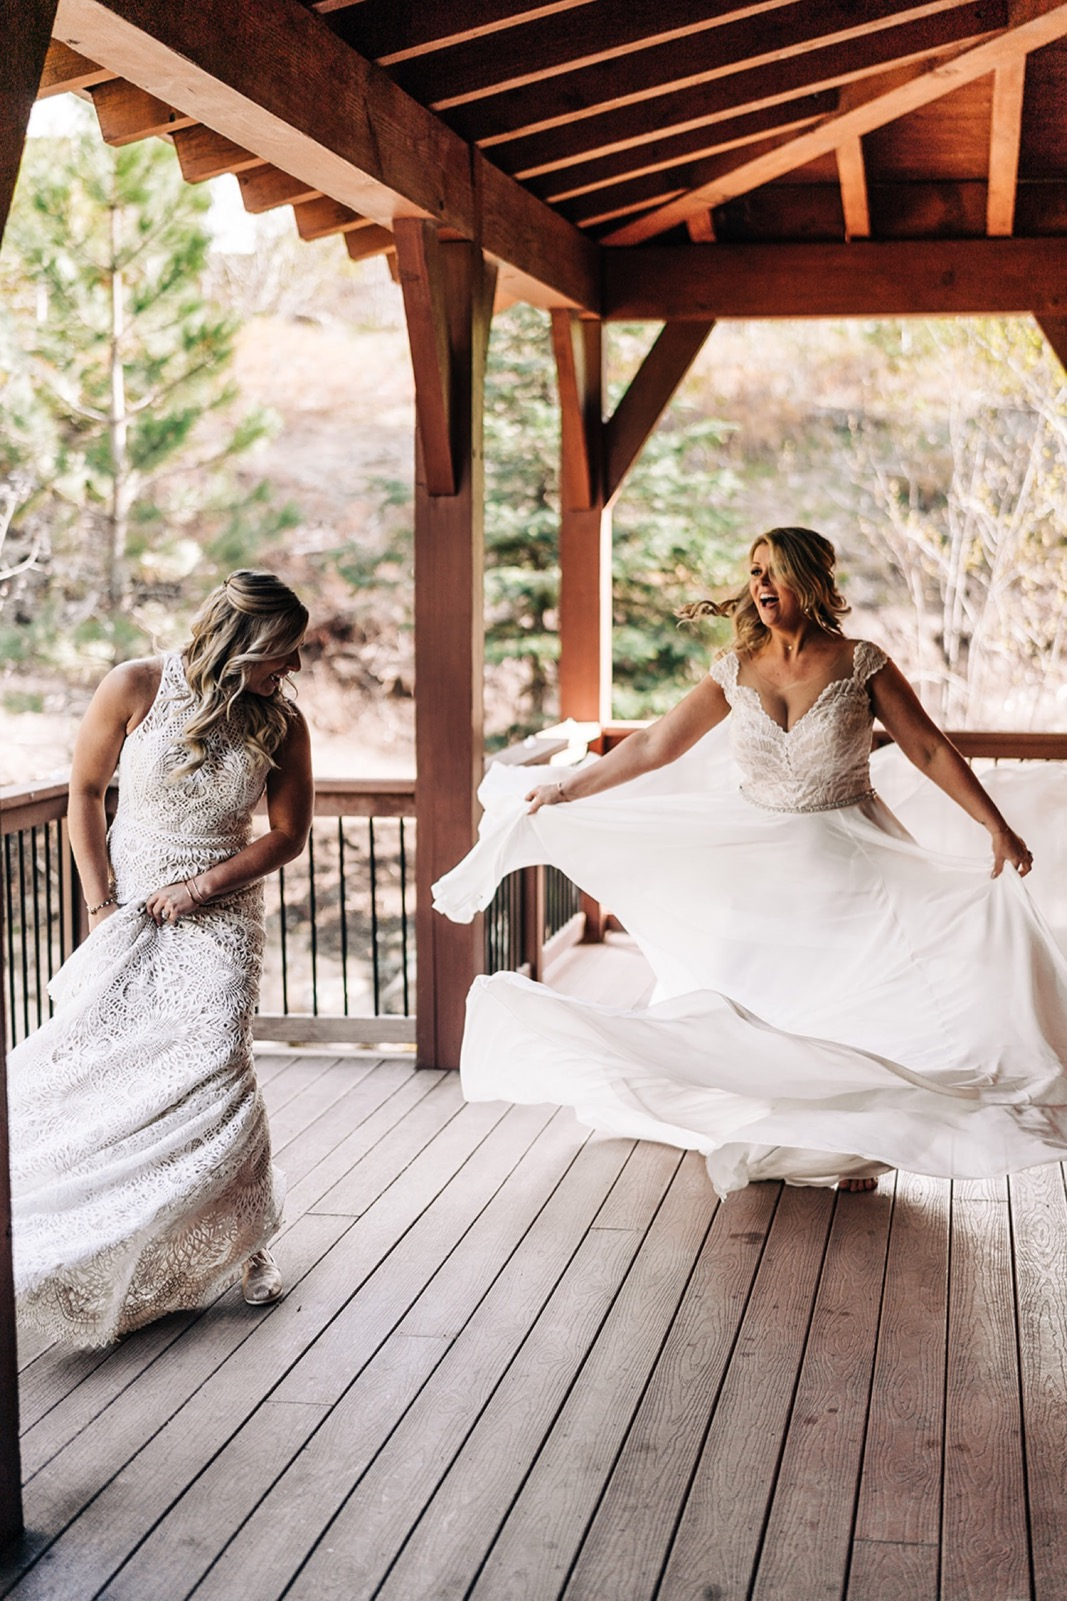 124_falissa_heather_wedding-393.jpg